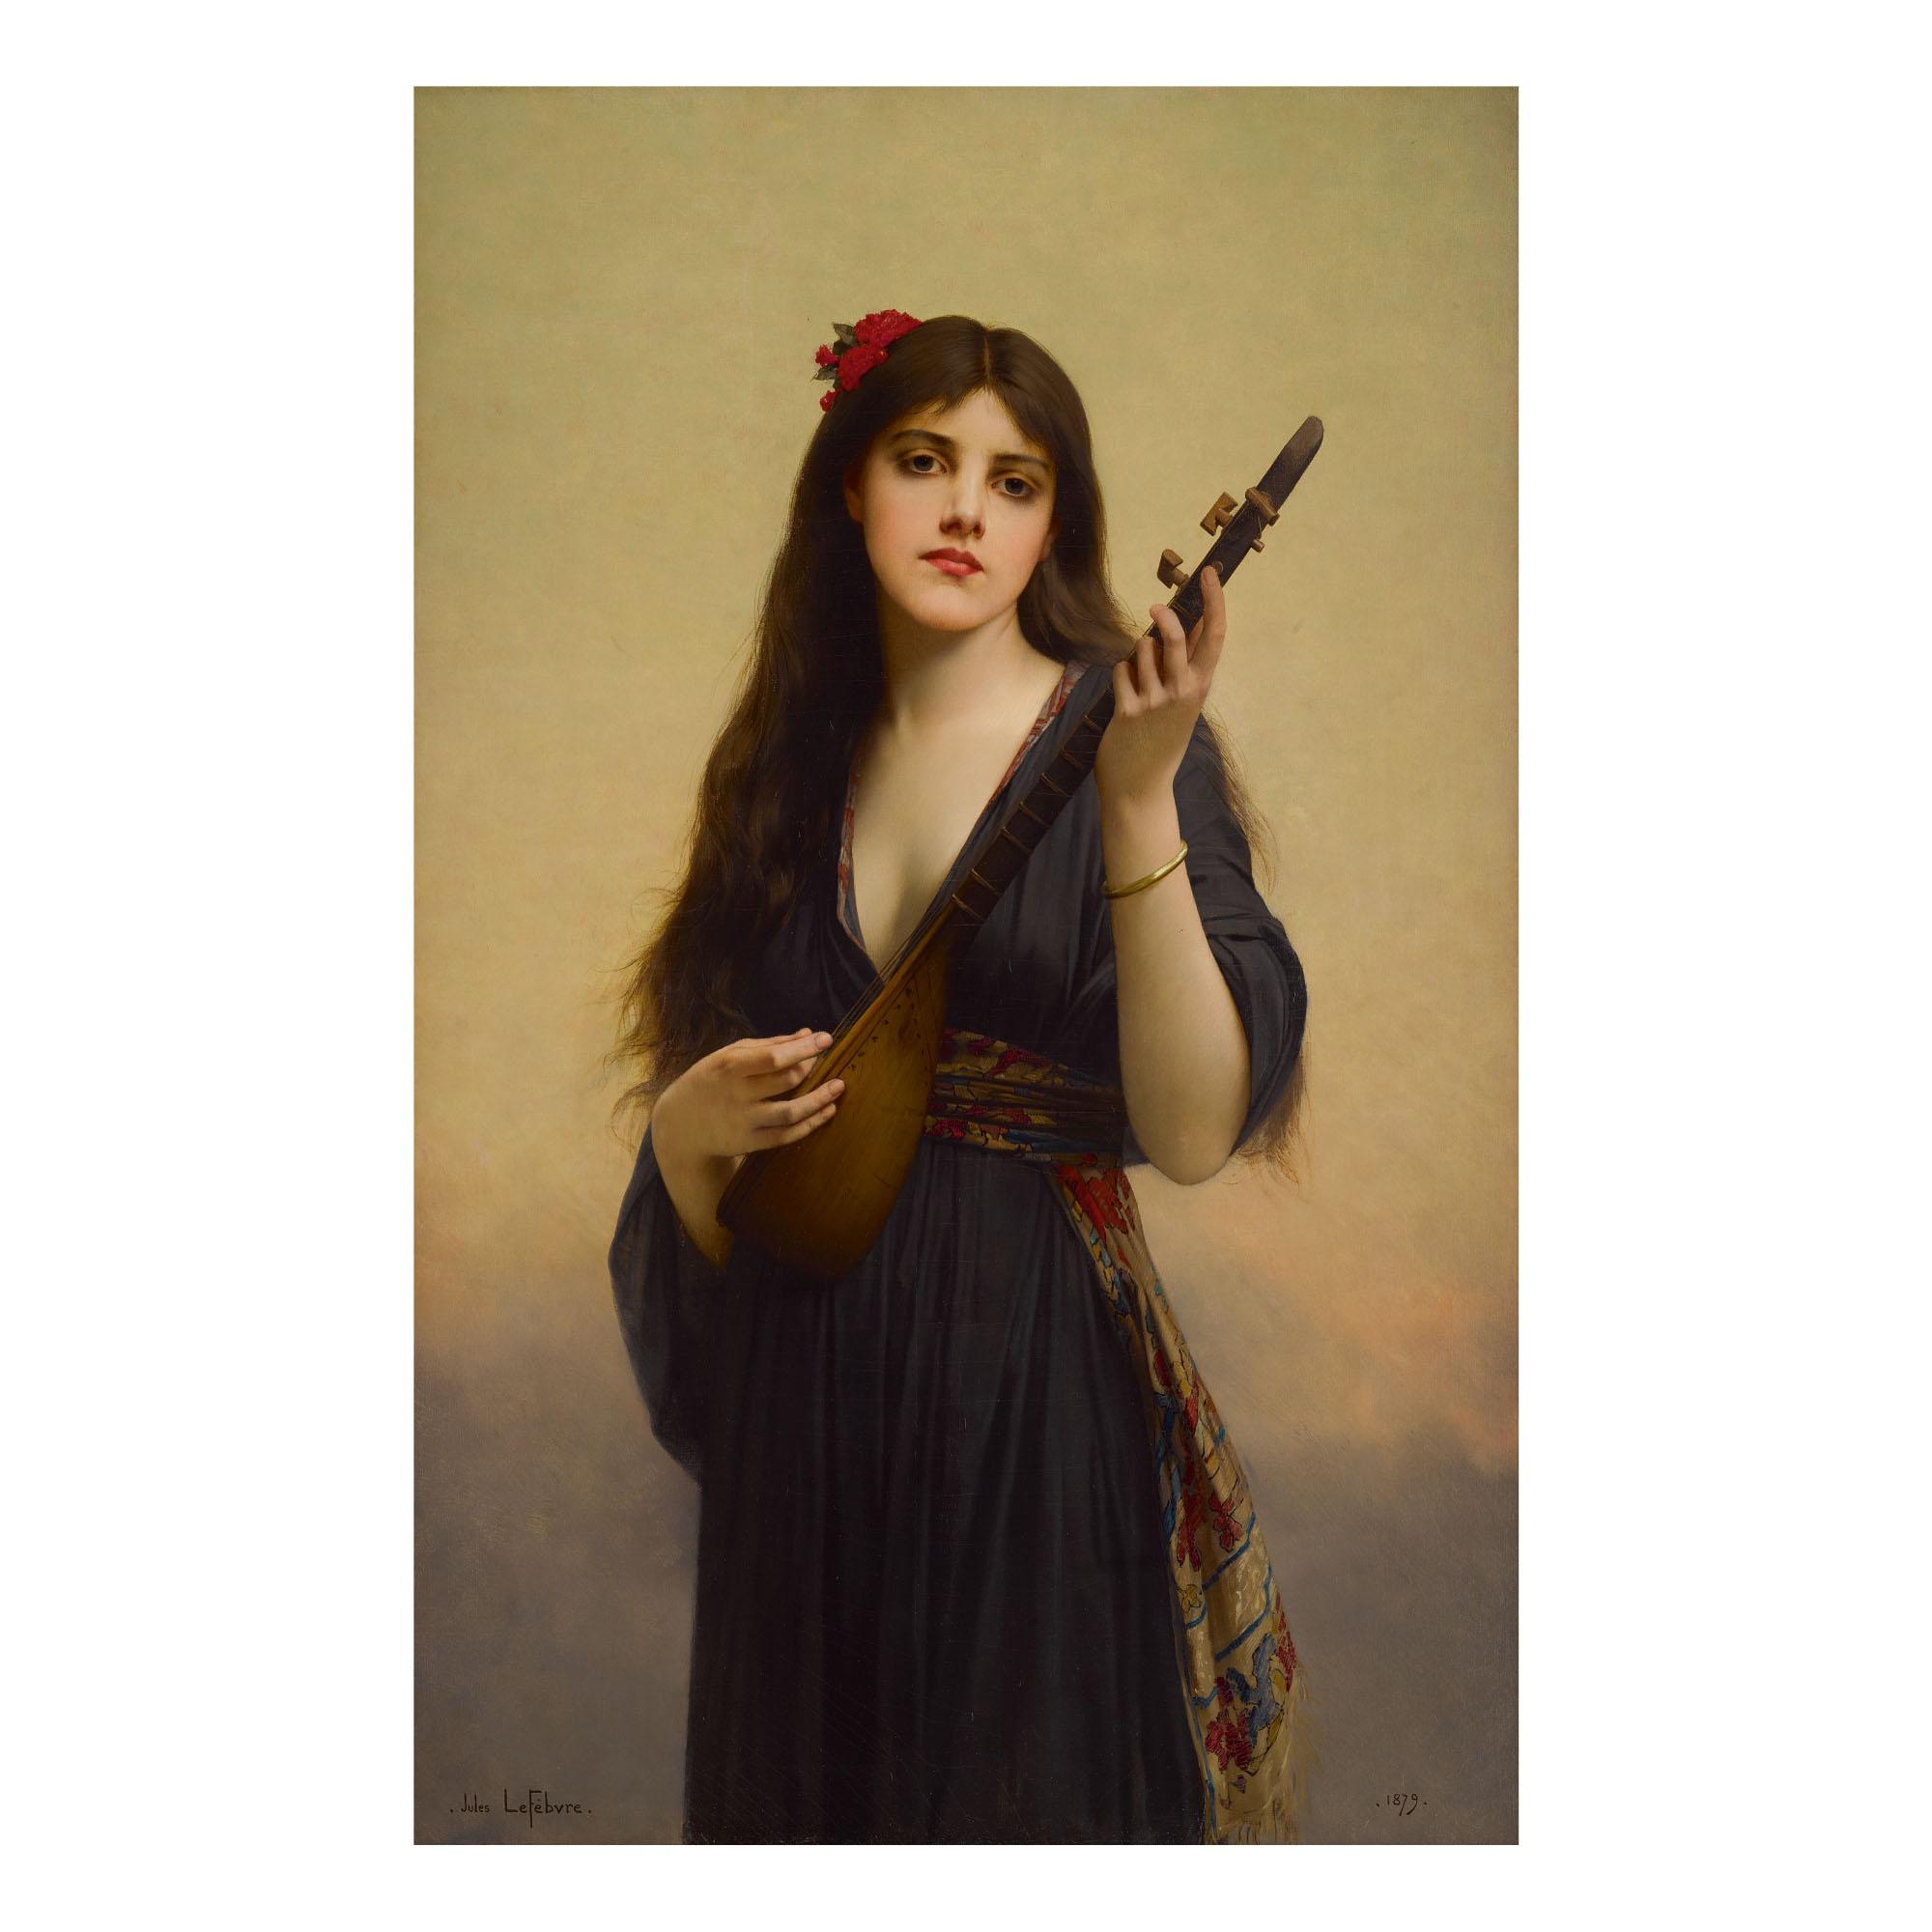 JULES JOSEPH LEFEBVRE | WOMAN PLAYING A LUTE